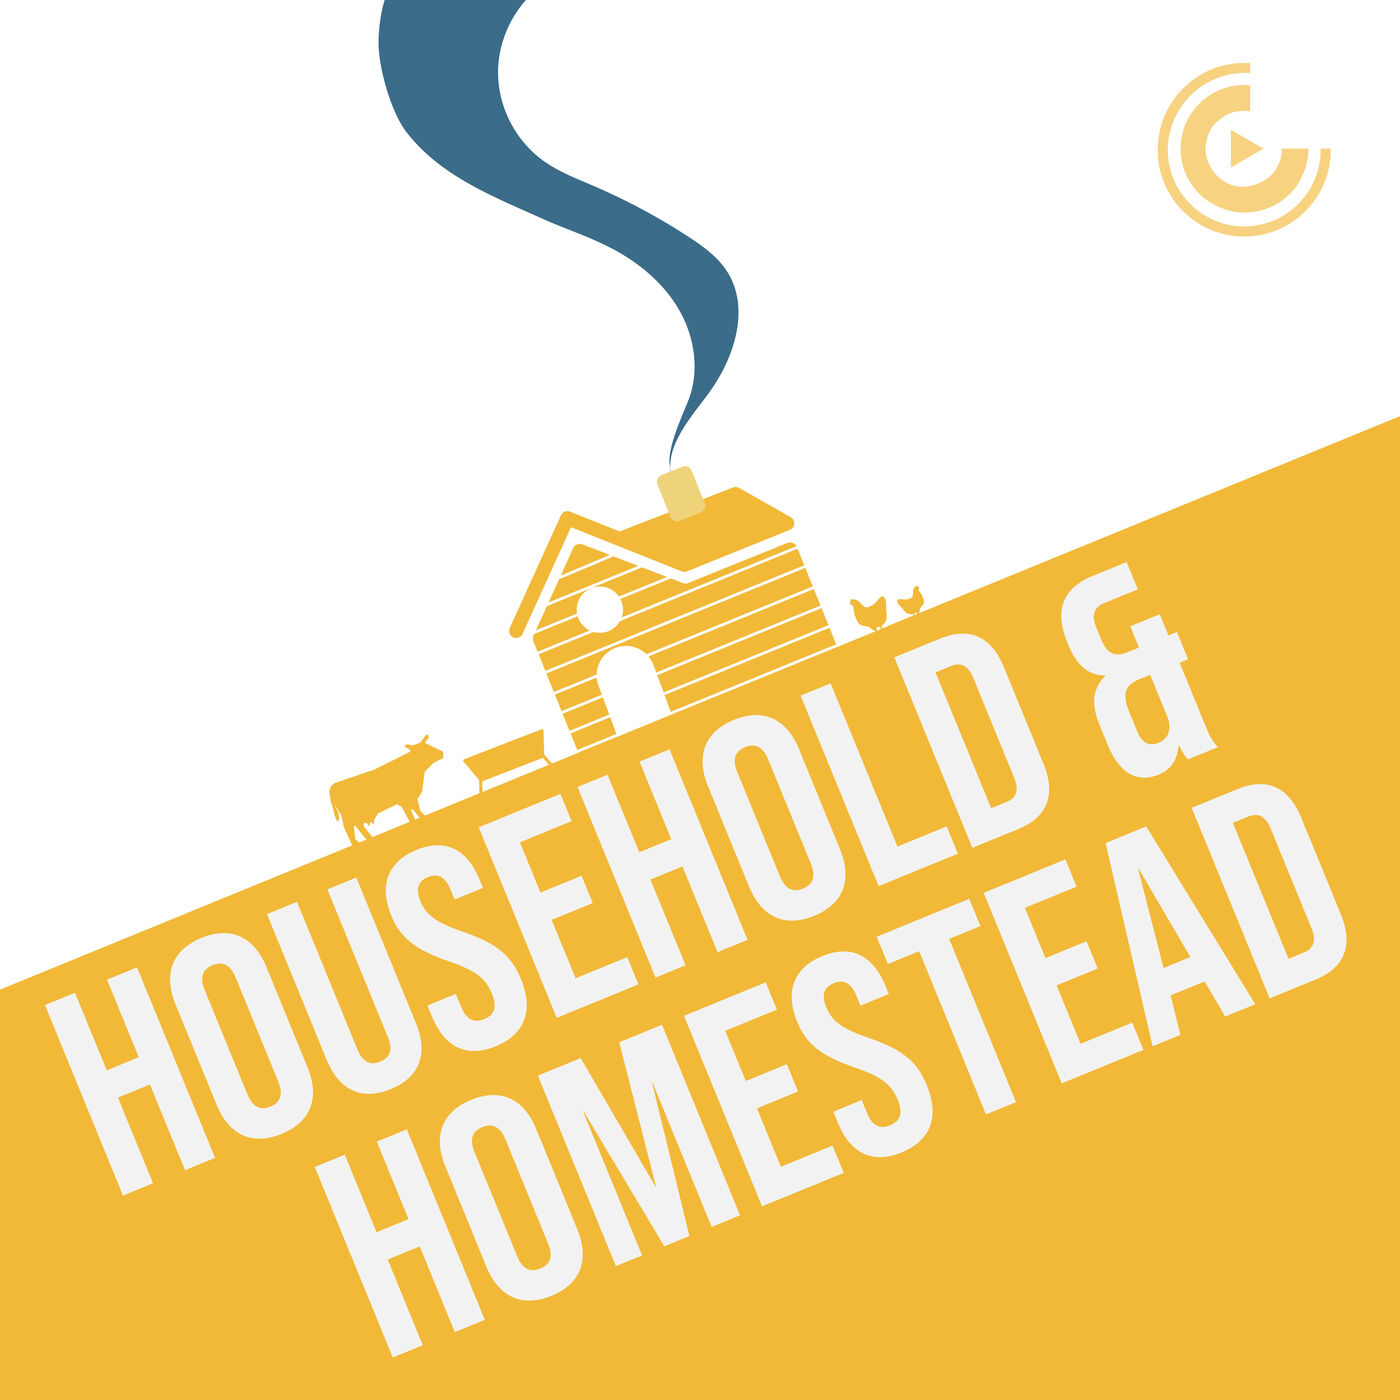 Household & Homestead | Episode #4: Homeschool vs. Harvard